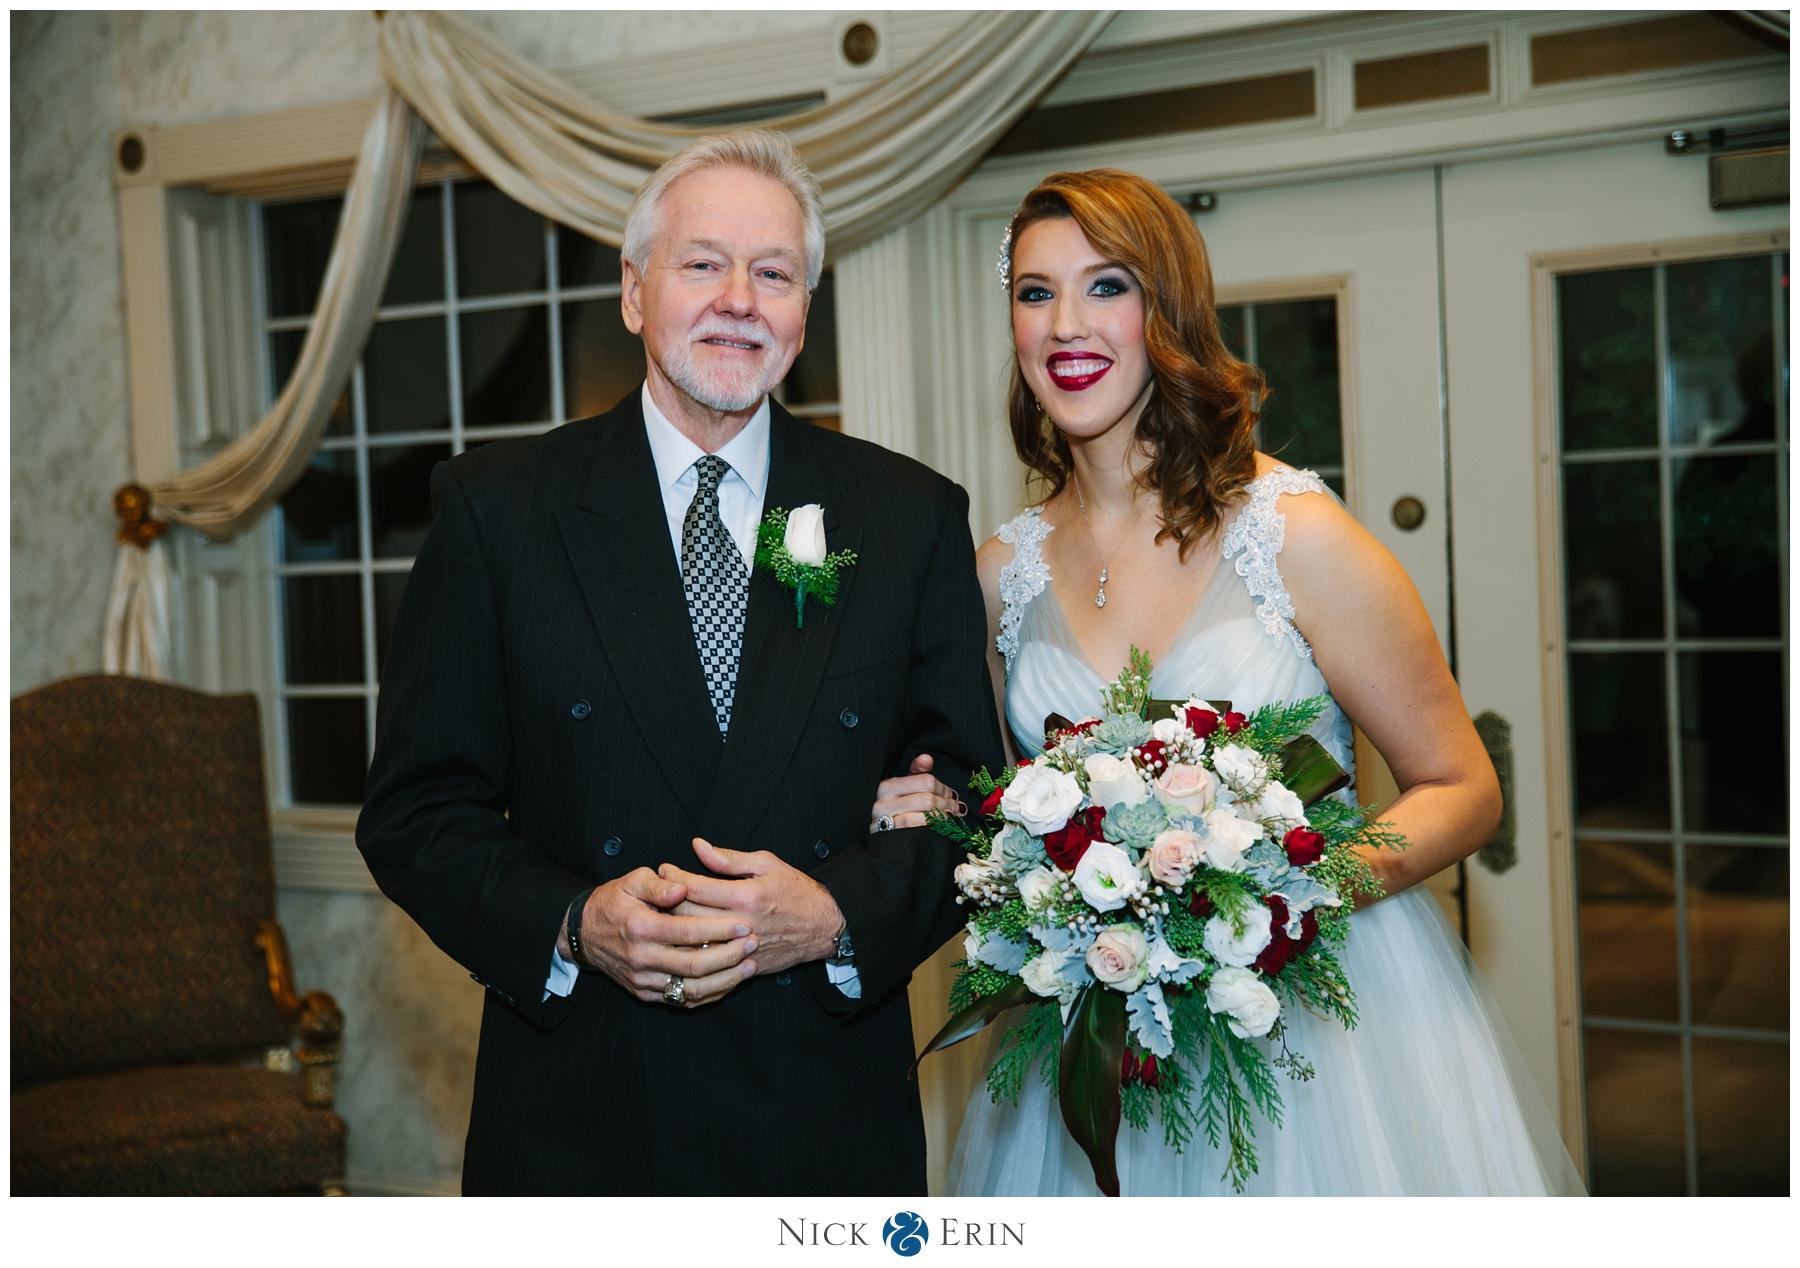 Donner_Photography_Mendenhall Inn Wedding_Blake & Kristina_0028